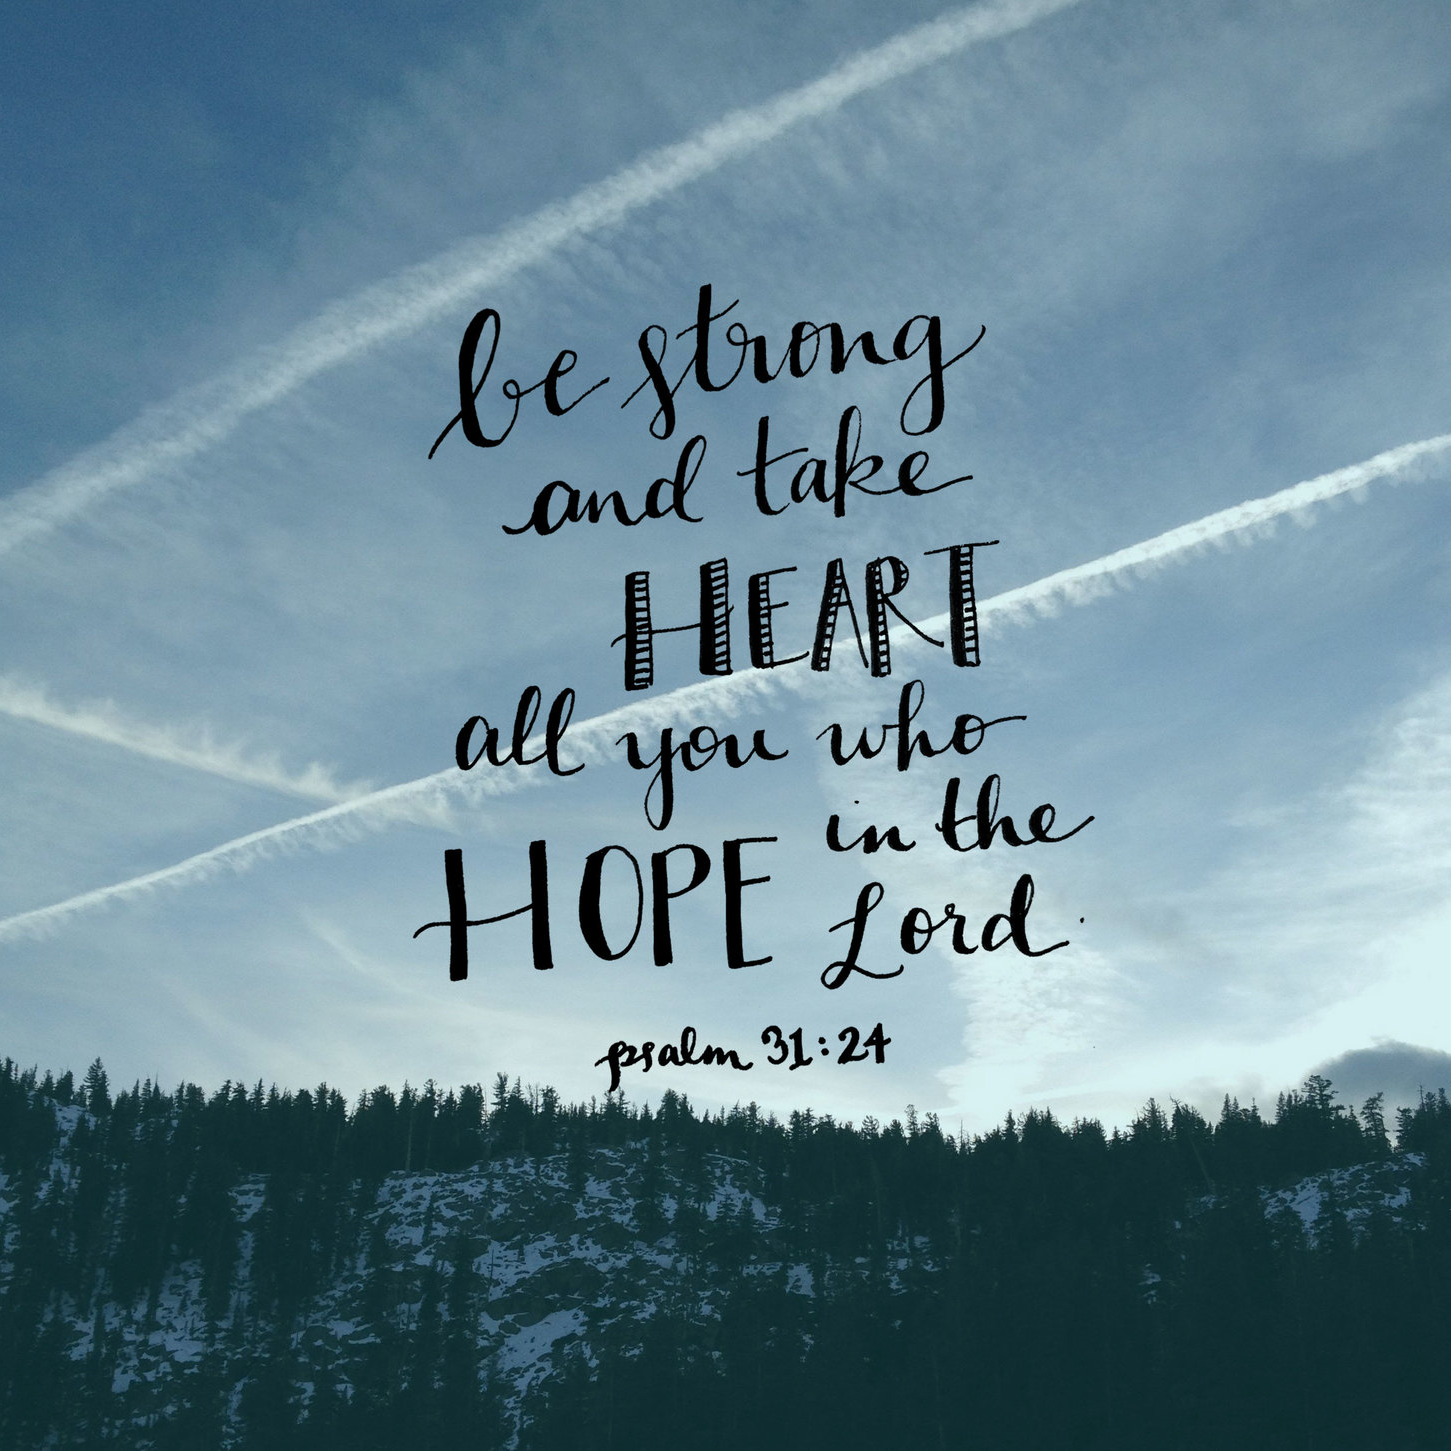 MARCH 2014 - PSALMS